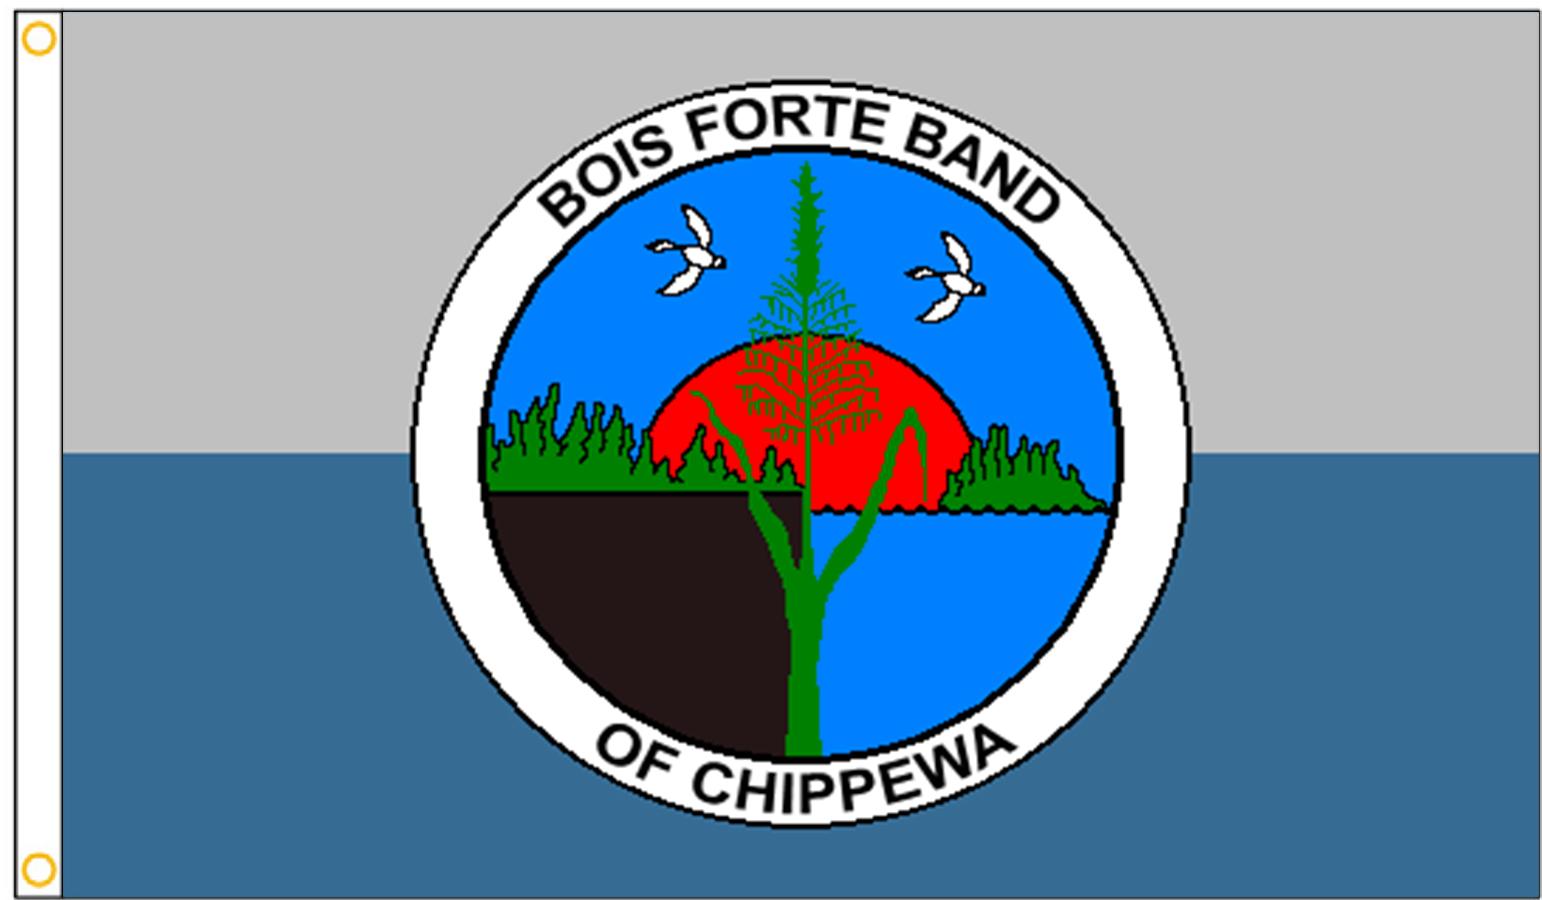 Bois Forte Band of Chippewa Flags